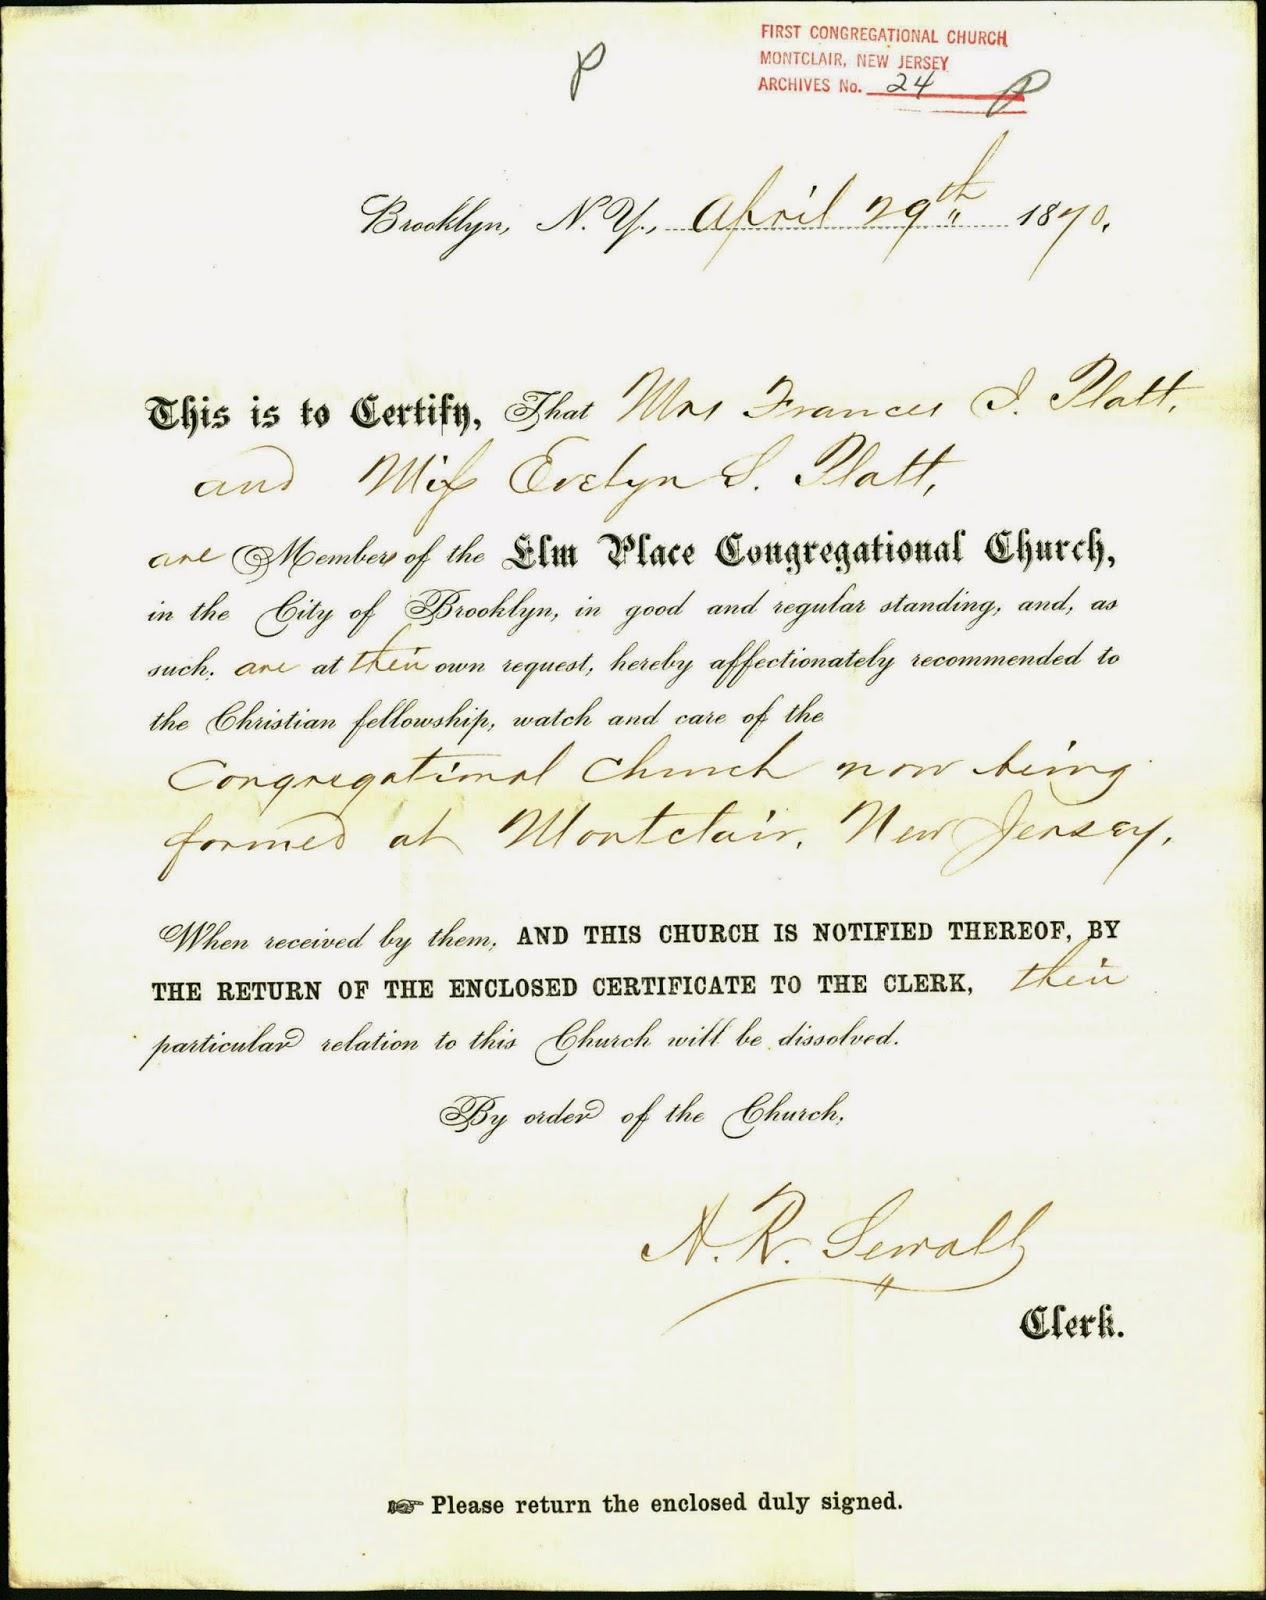 History Of First Congregational Church Montclair Nj Letter Elm